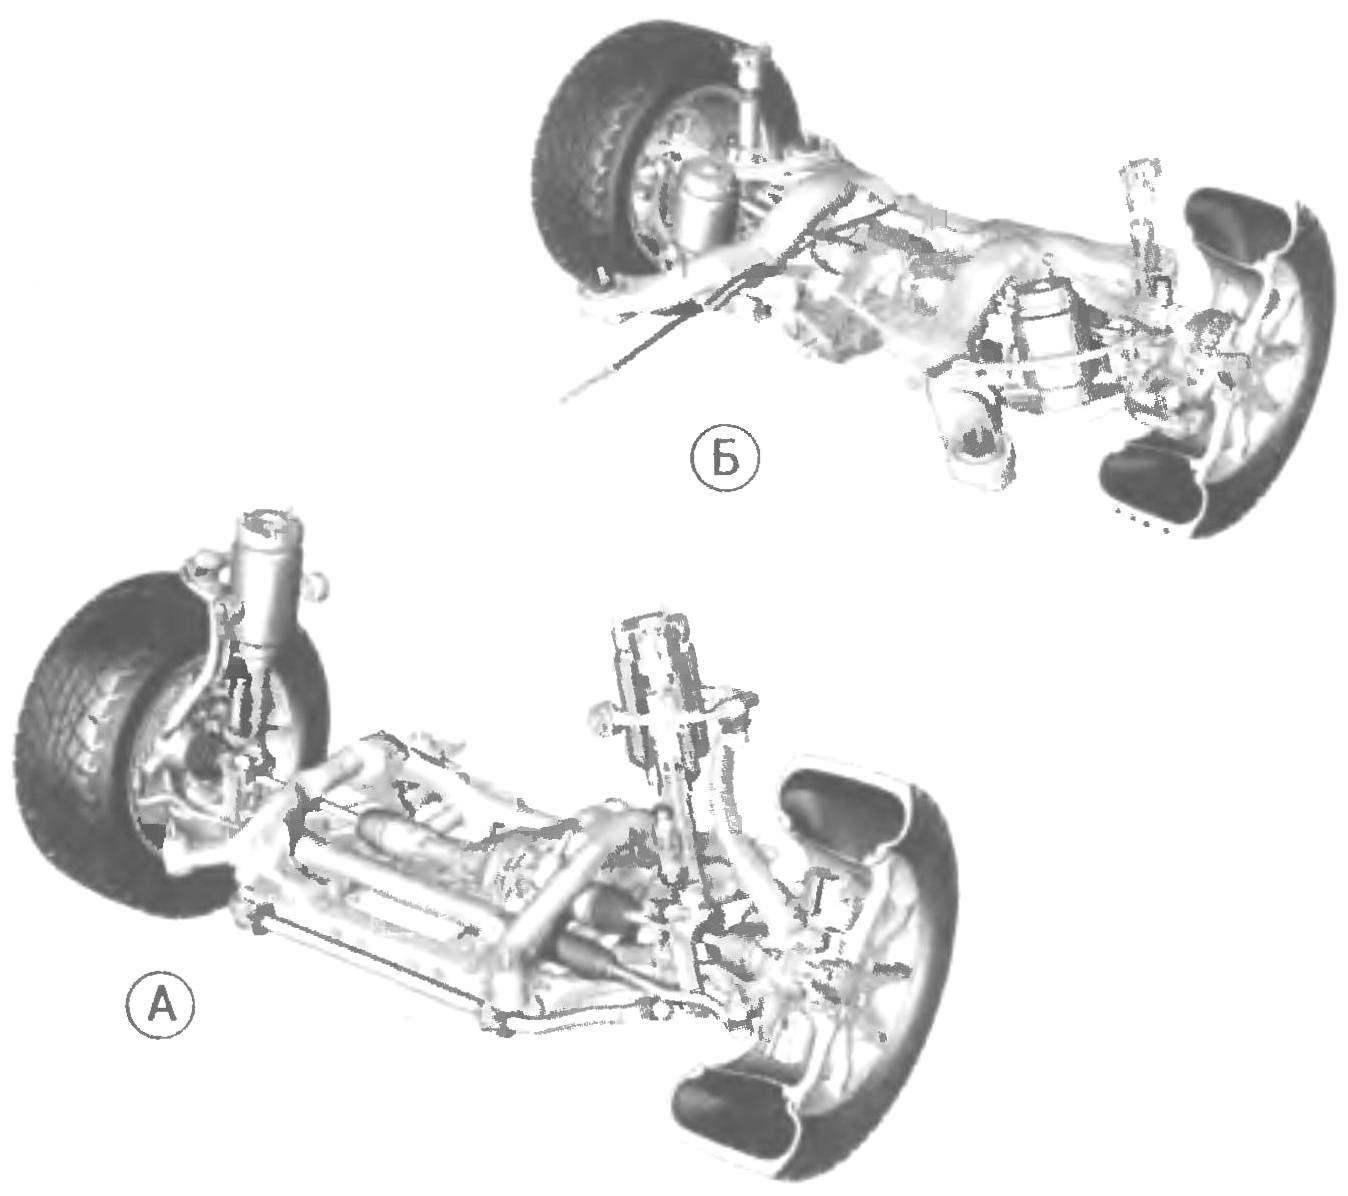 Передняя (А) и задняя (Б) подвески автомобиля